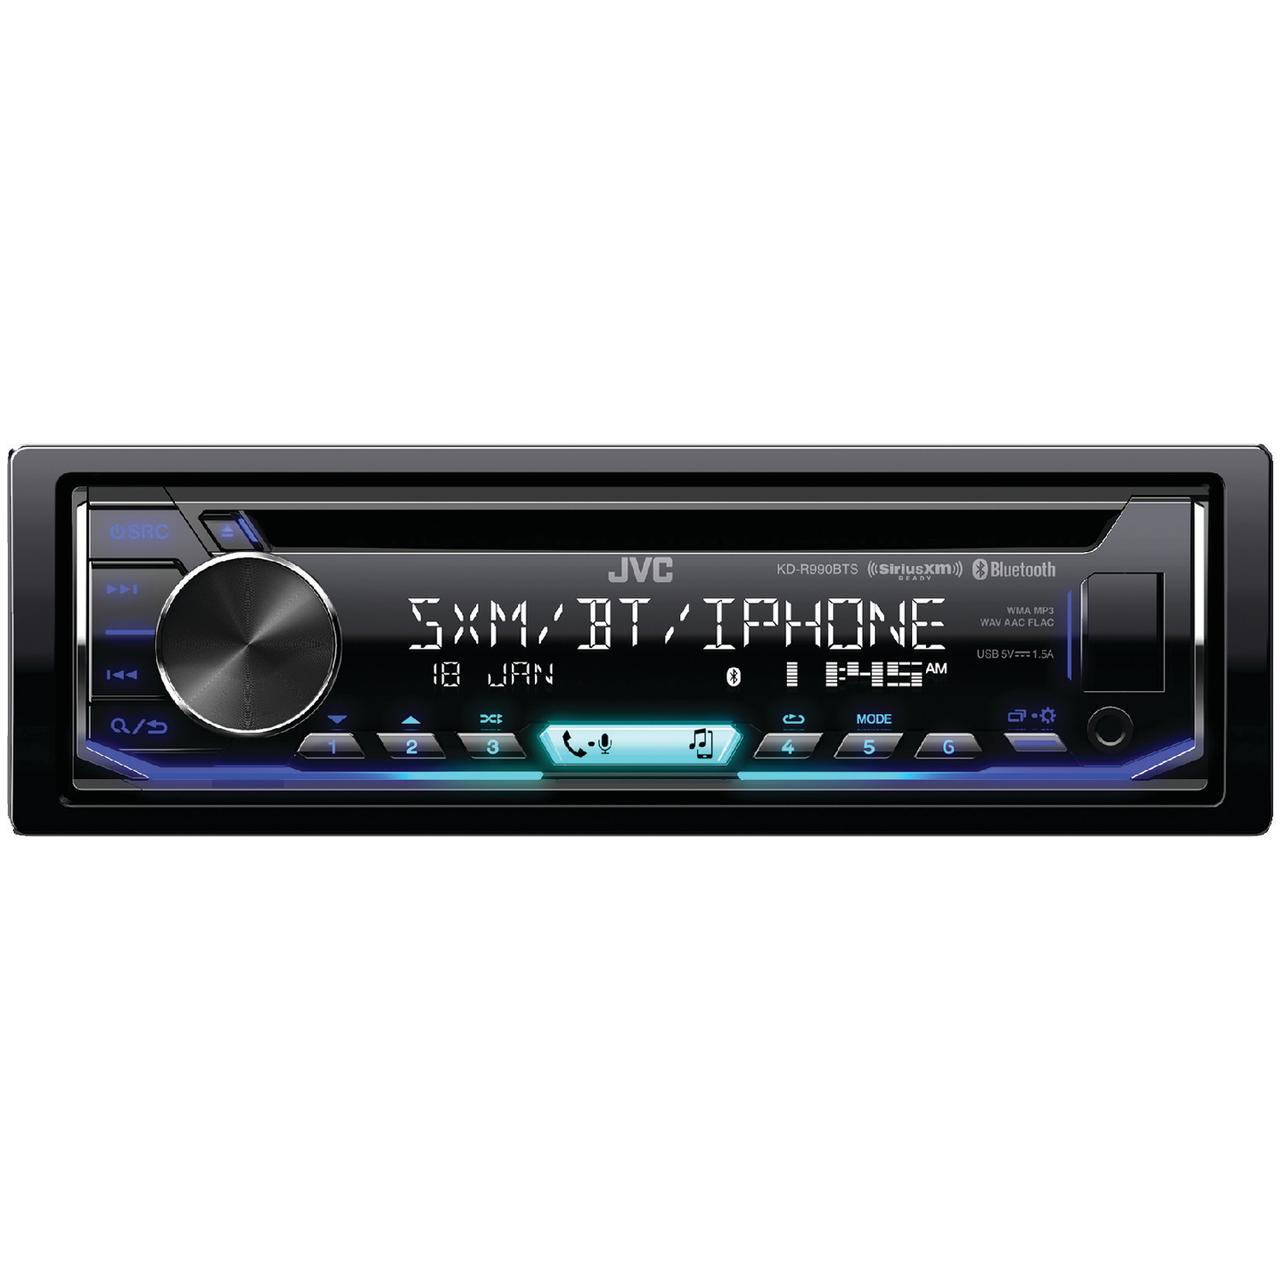 JVC Mobile KD-R990BTS KD-R990BTS Single-DIN In-Dash AM/FM CD Receiver with Bluetooth & SiriusXM Ready